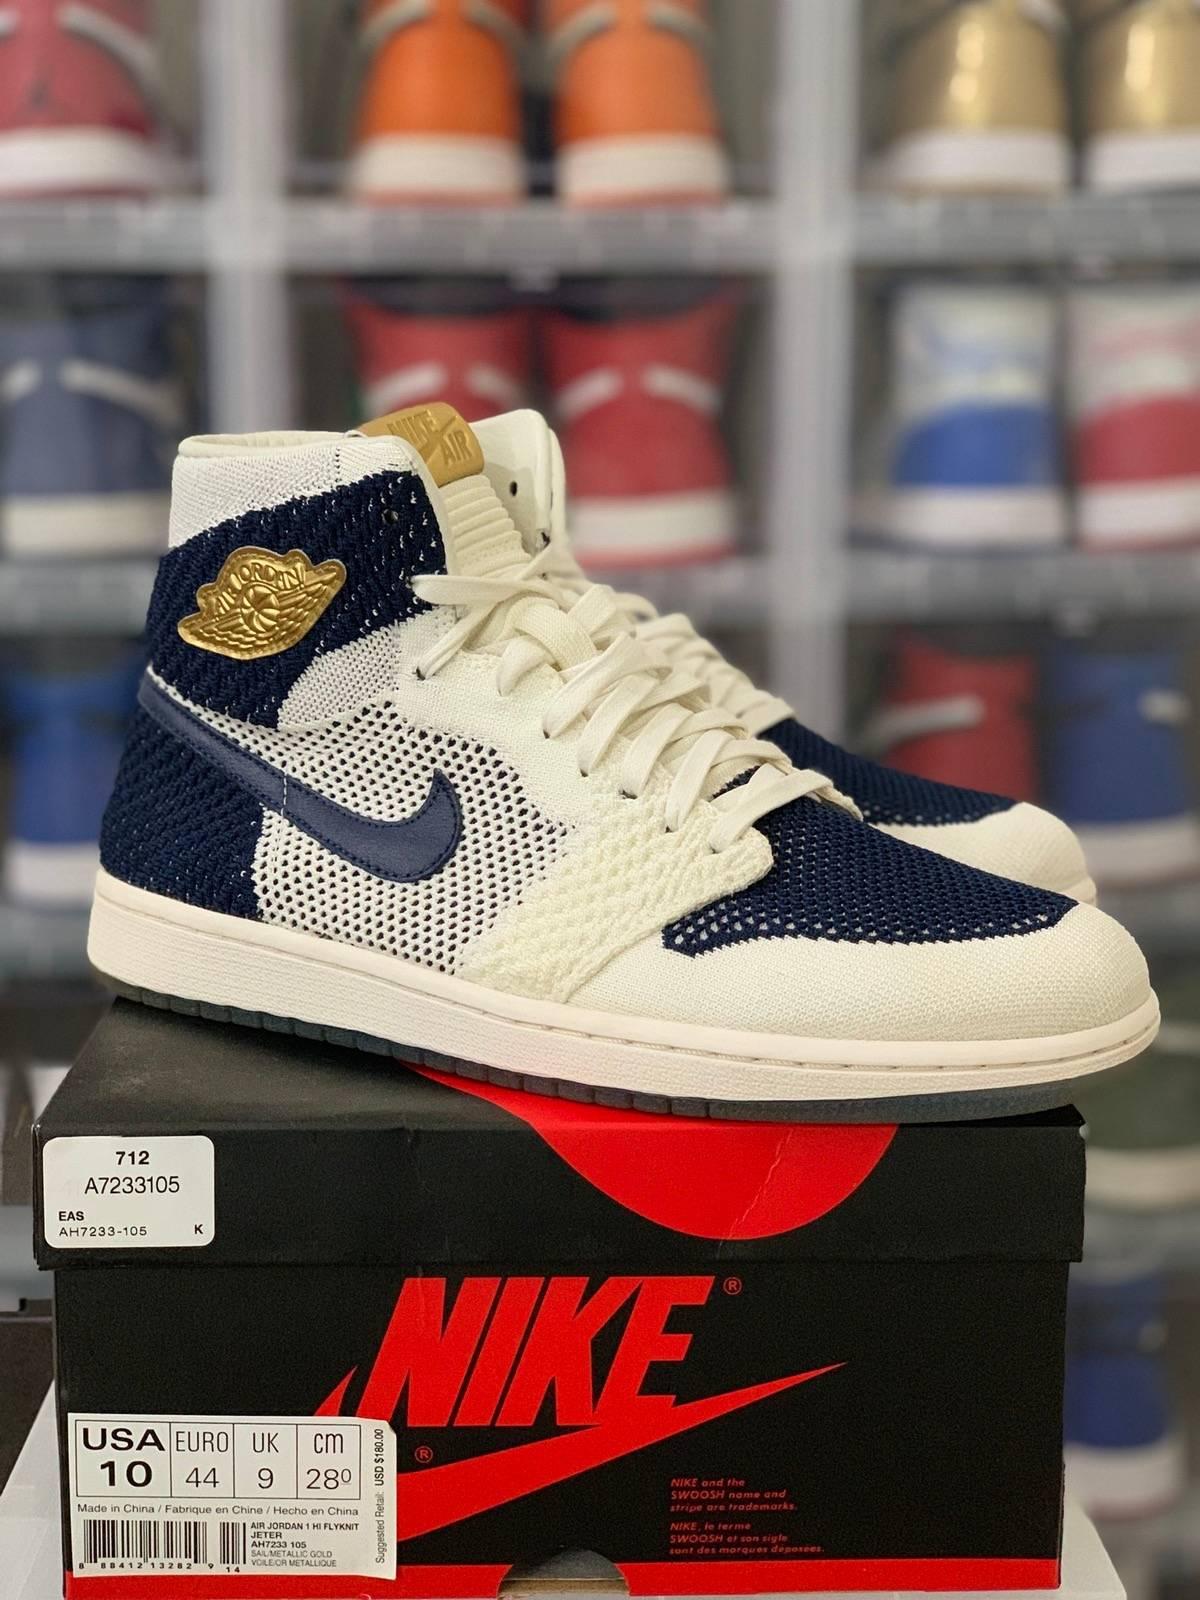 d61ac7e13705 Nike × Jordan Brand ×. Nike Air Jordan 1 Retro High Flyknit ...